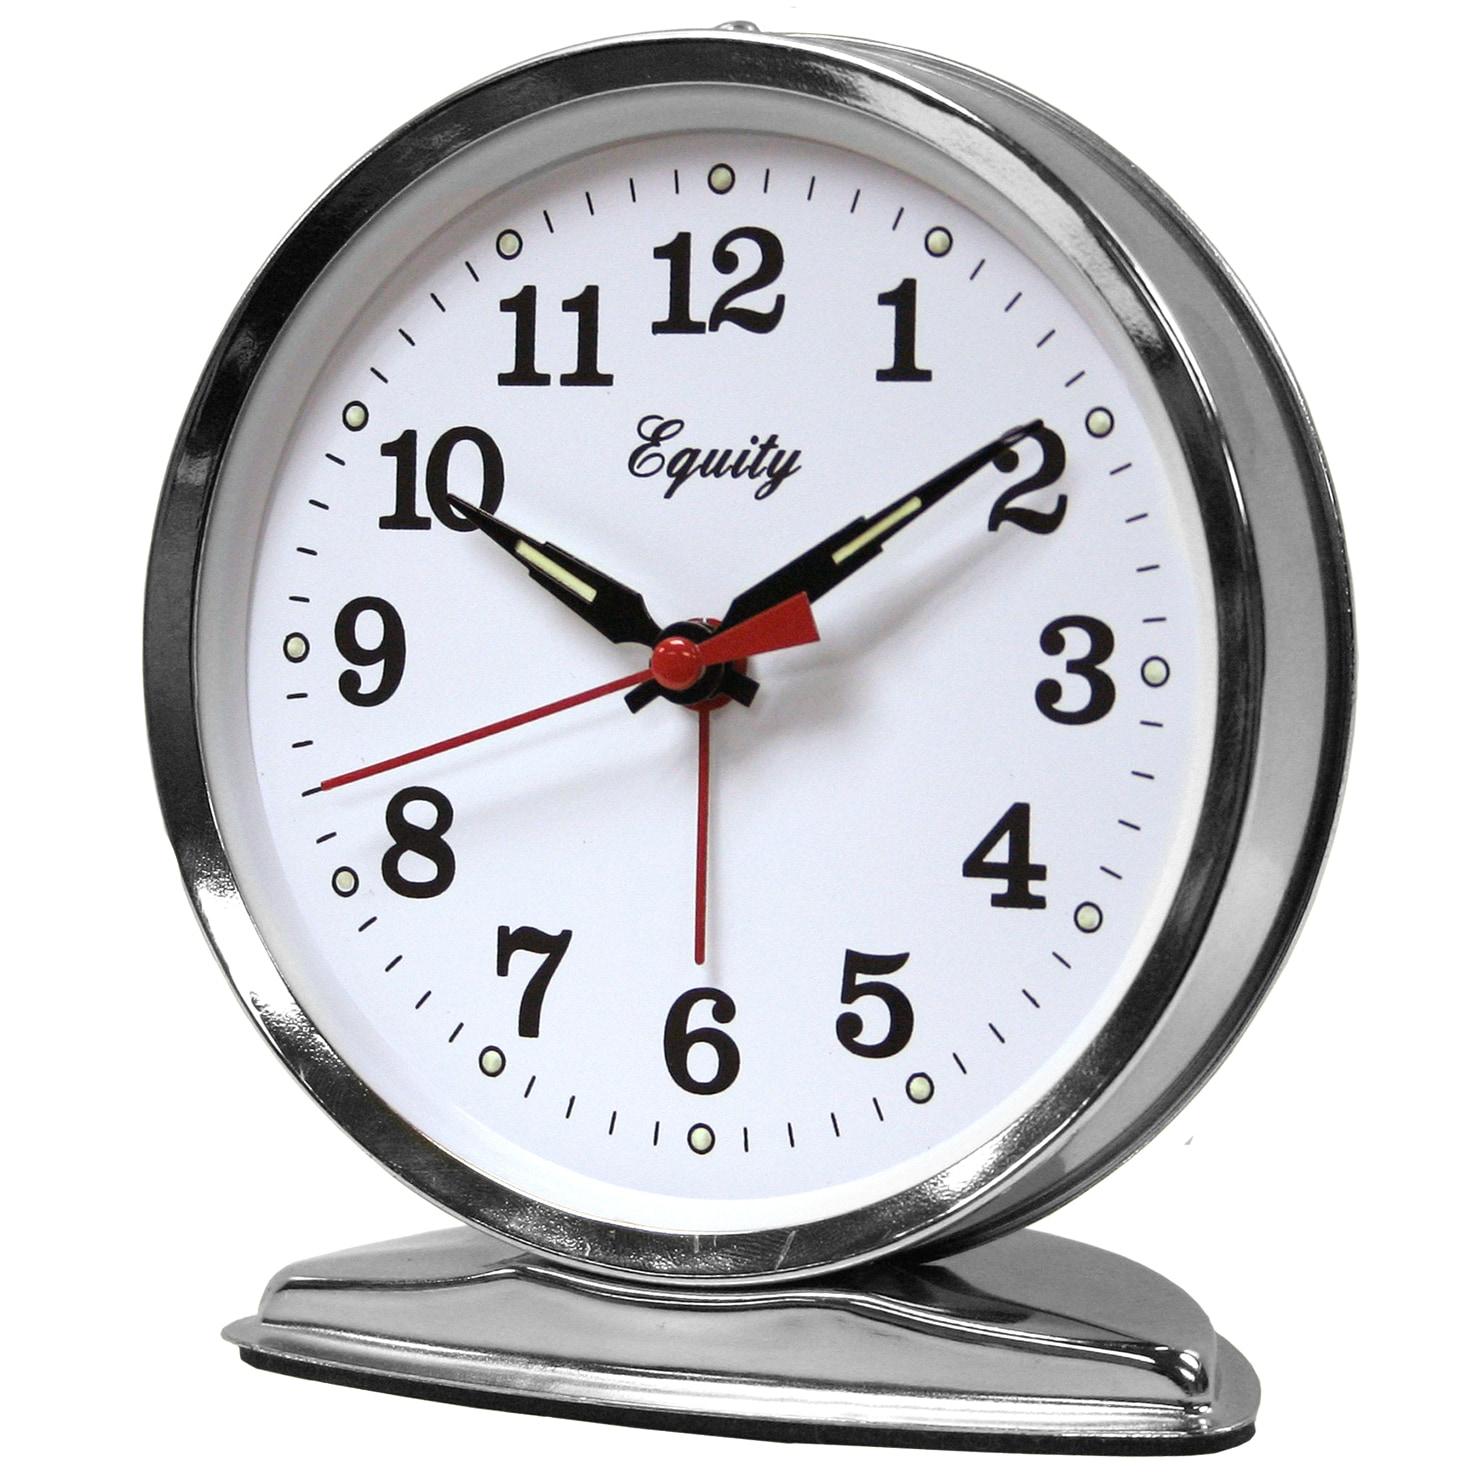 "Equity 24014 4.5"" Chrome (Grey) Wind Up Alarm Clock (Cloc..."